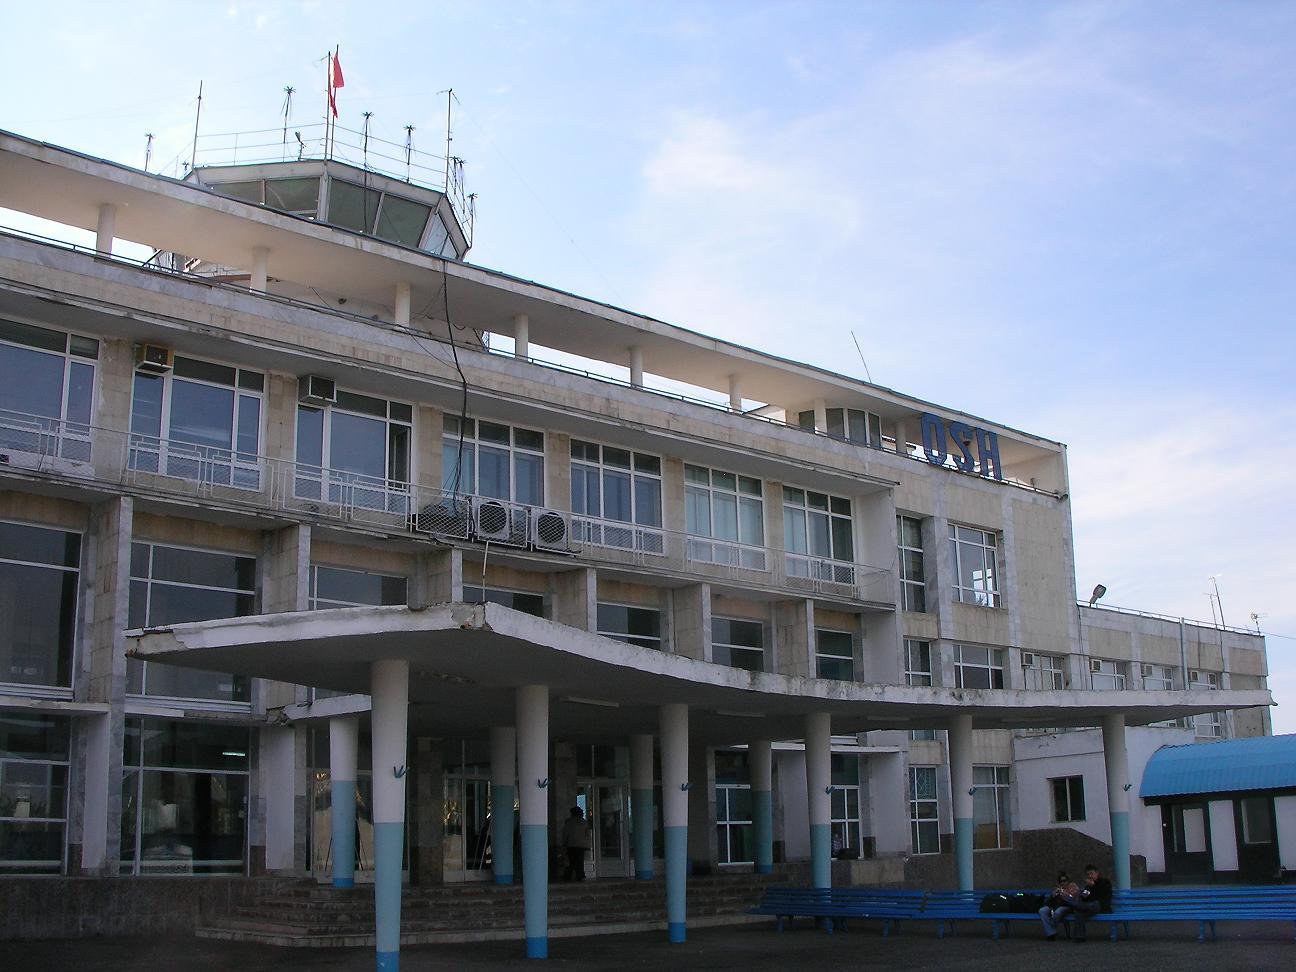 Аэропорт Ош (Osh Airport).1